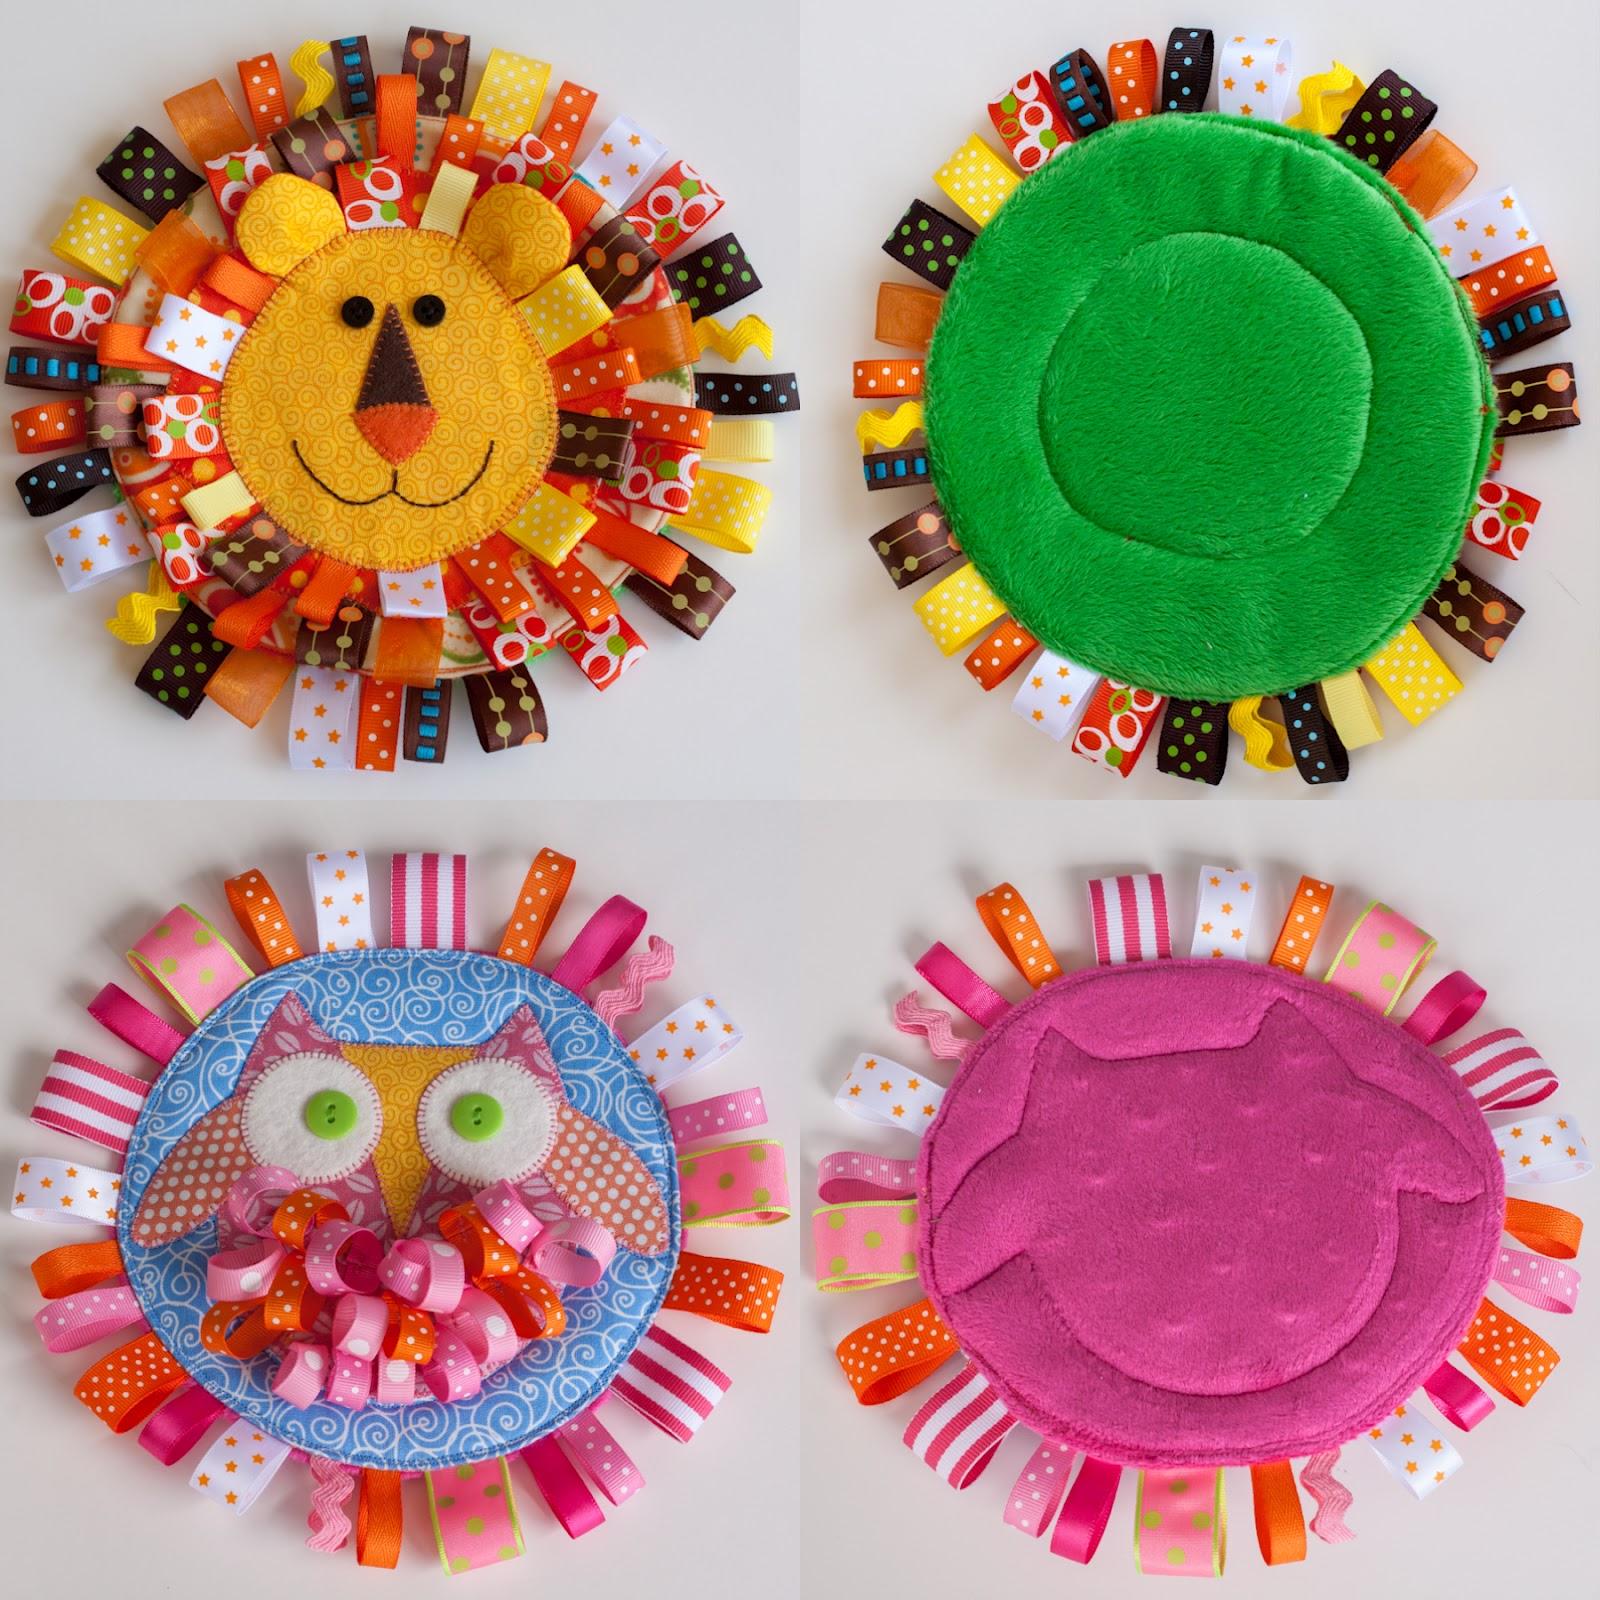 Toys For Sensory : June baby sensory tag toys